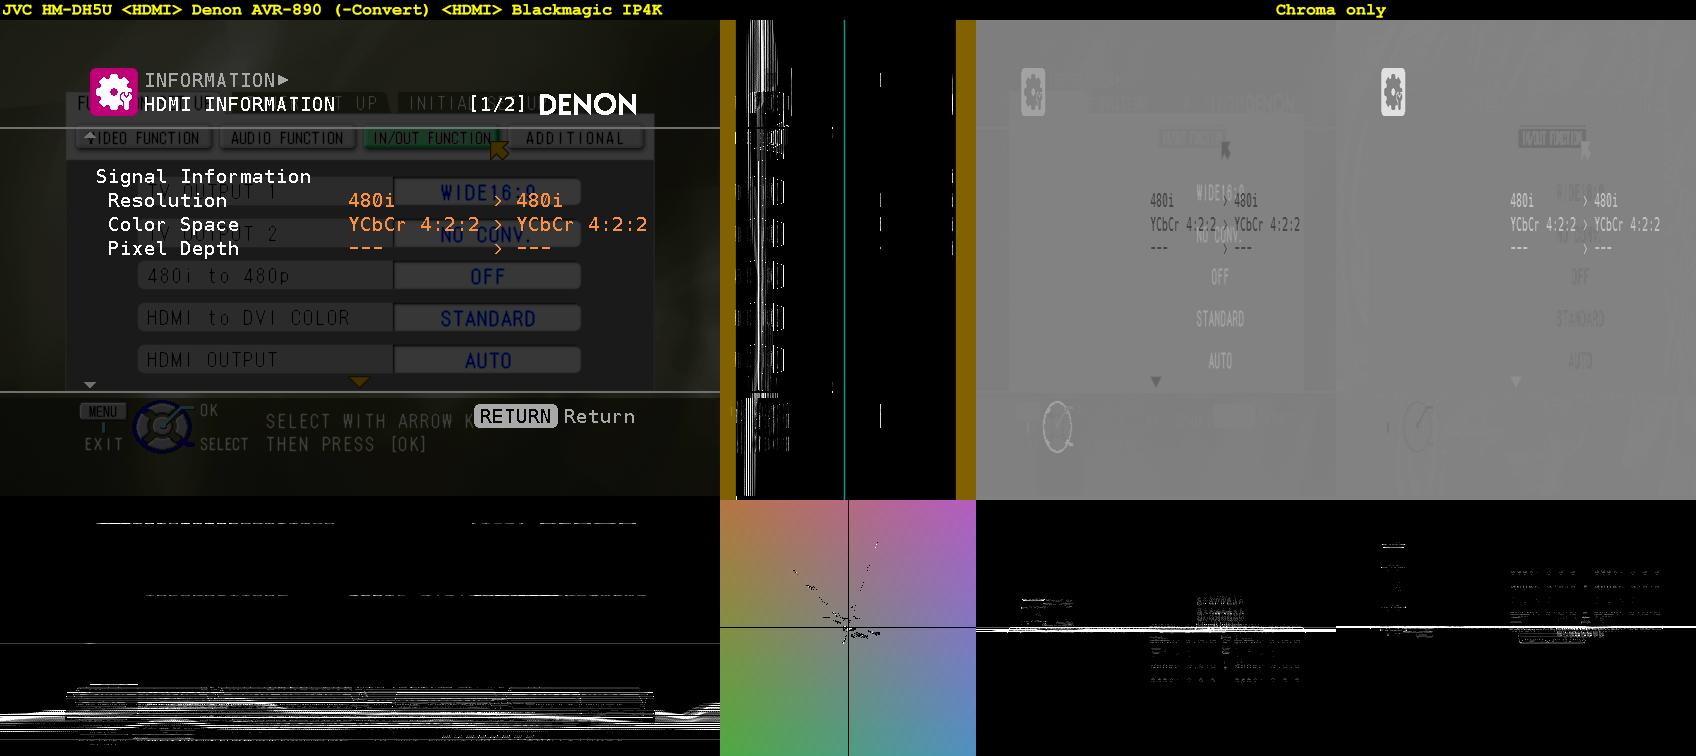 Click image for larger version  Name:Menu + Info - JVC HM-DH5U =HDMI= Denon AVR-890, -Convert =HDMI= IP4K.png Views:3093 Size:271.2 KB ID:35273